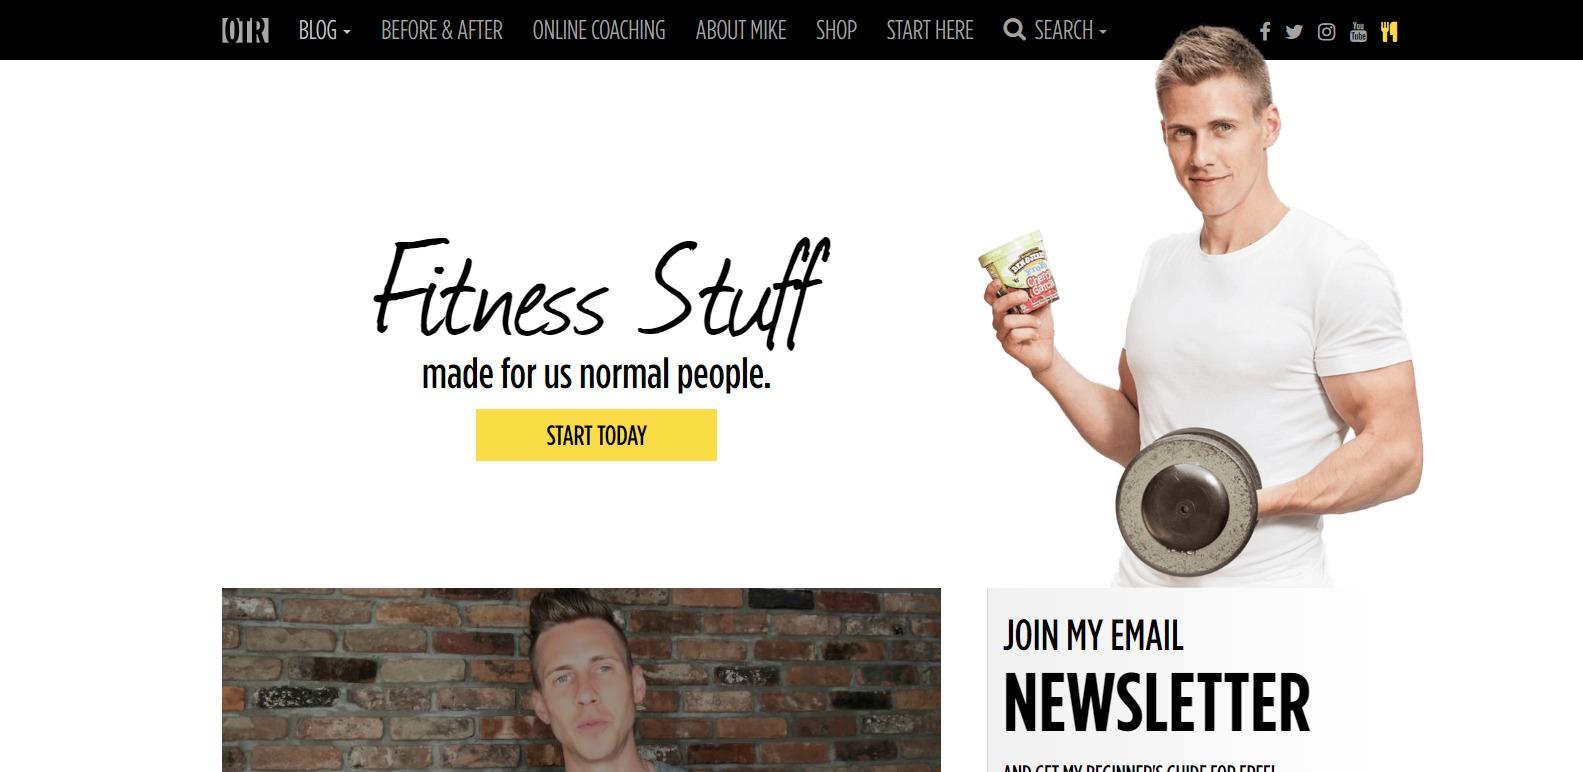 On The Regimen Fitness websites